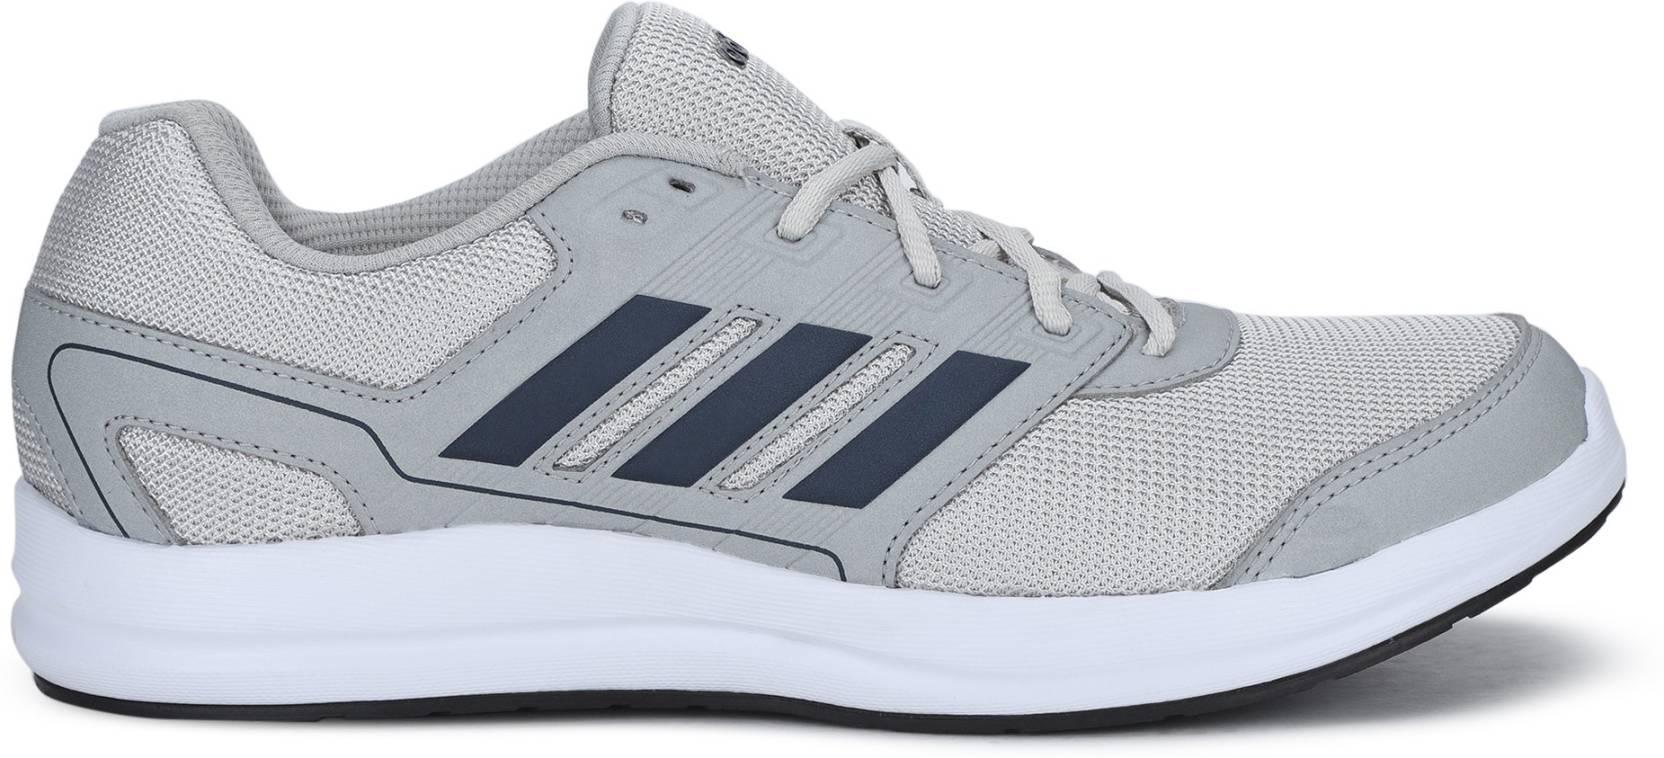 ADIDASHELLION Z M Running Shoes For Men(Grey)